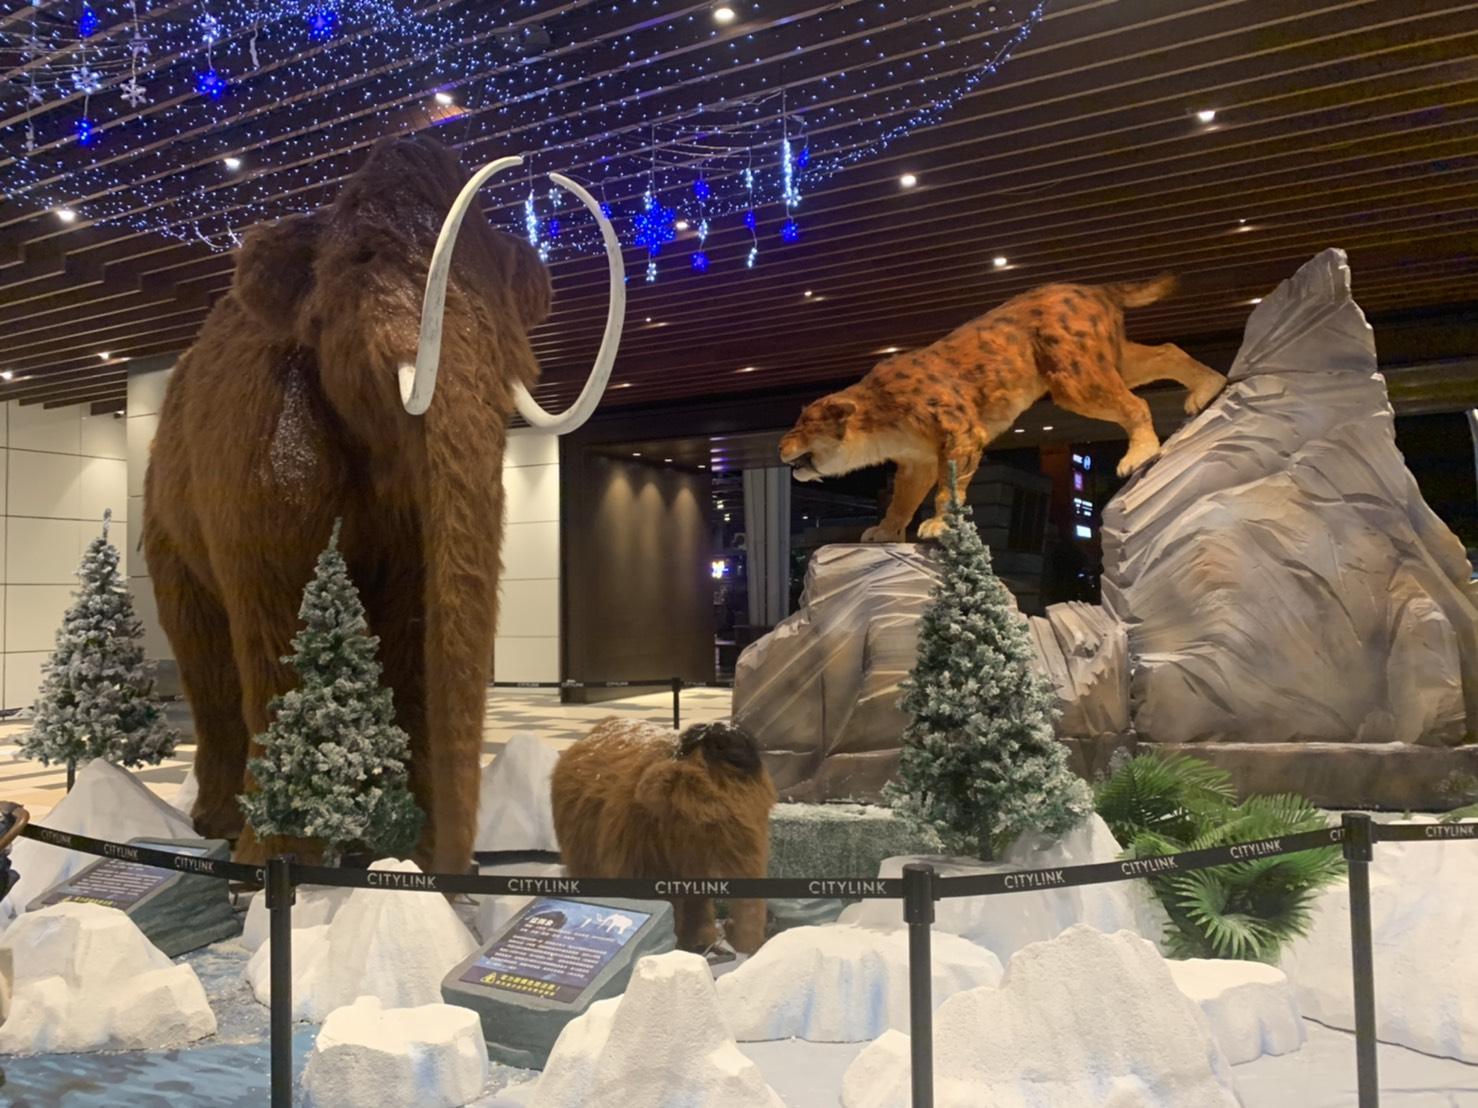 CITYLINK南港店年底強檔企劃超時空冰河時代,可以看大型恐龍、劍齒虎、長毛象出沒。圖/W編